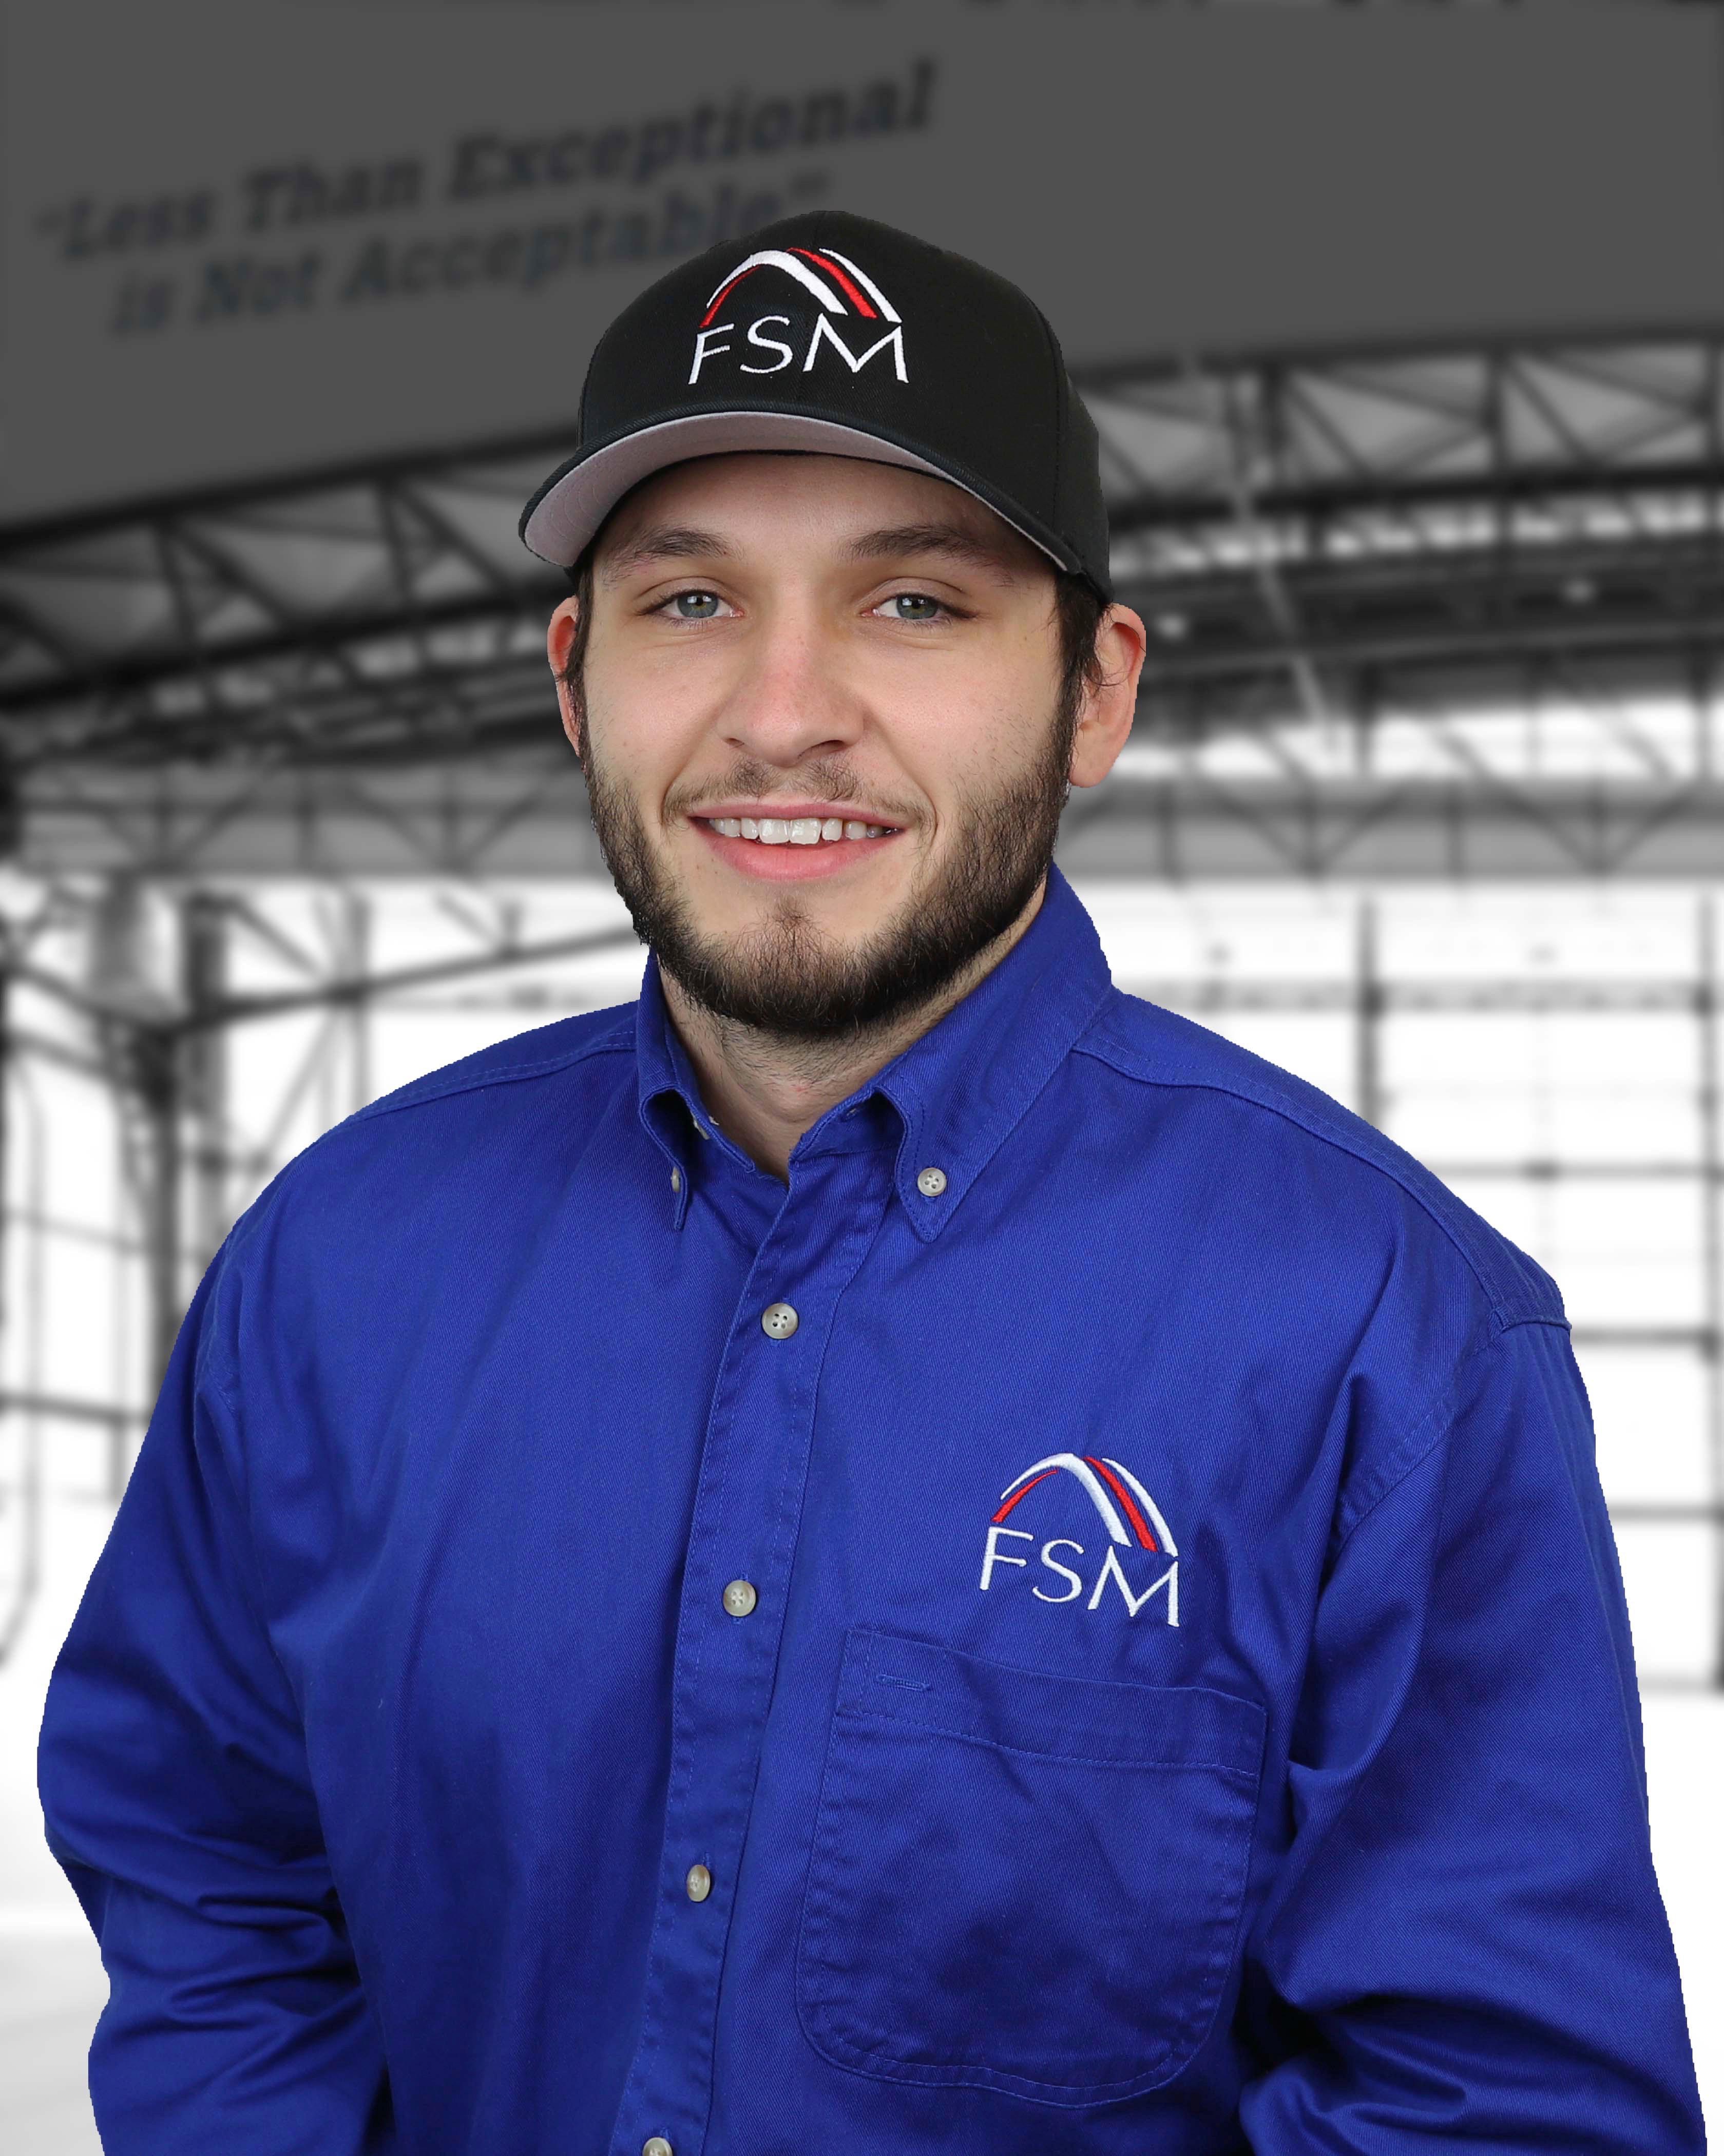 FSM Nate Fogle Electrical Apprentice